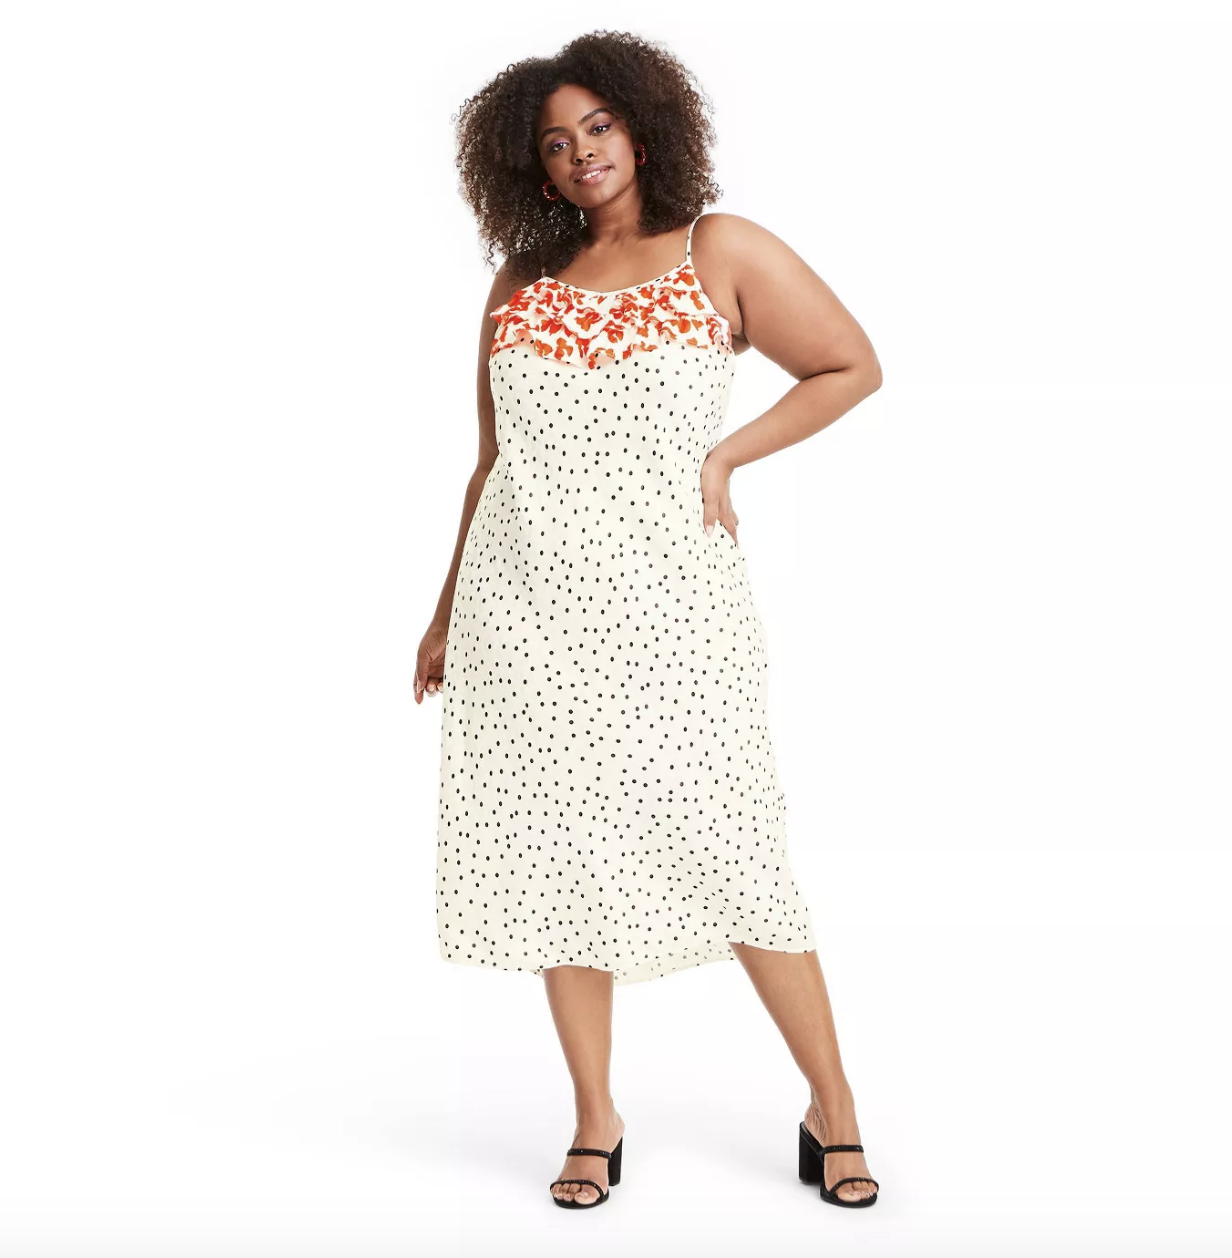 model wearing the polka dot dress